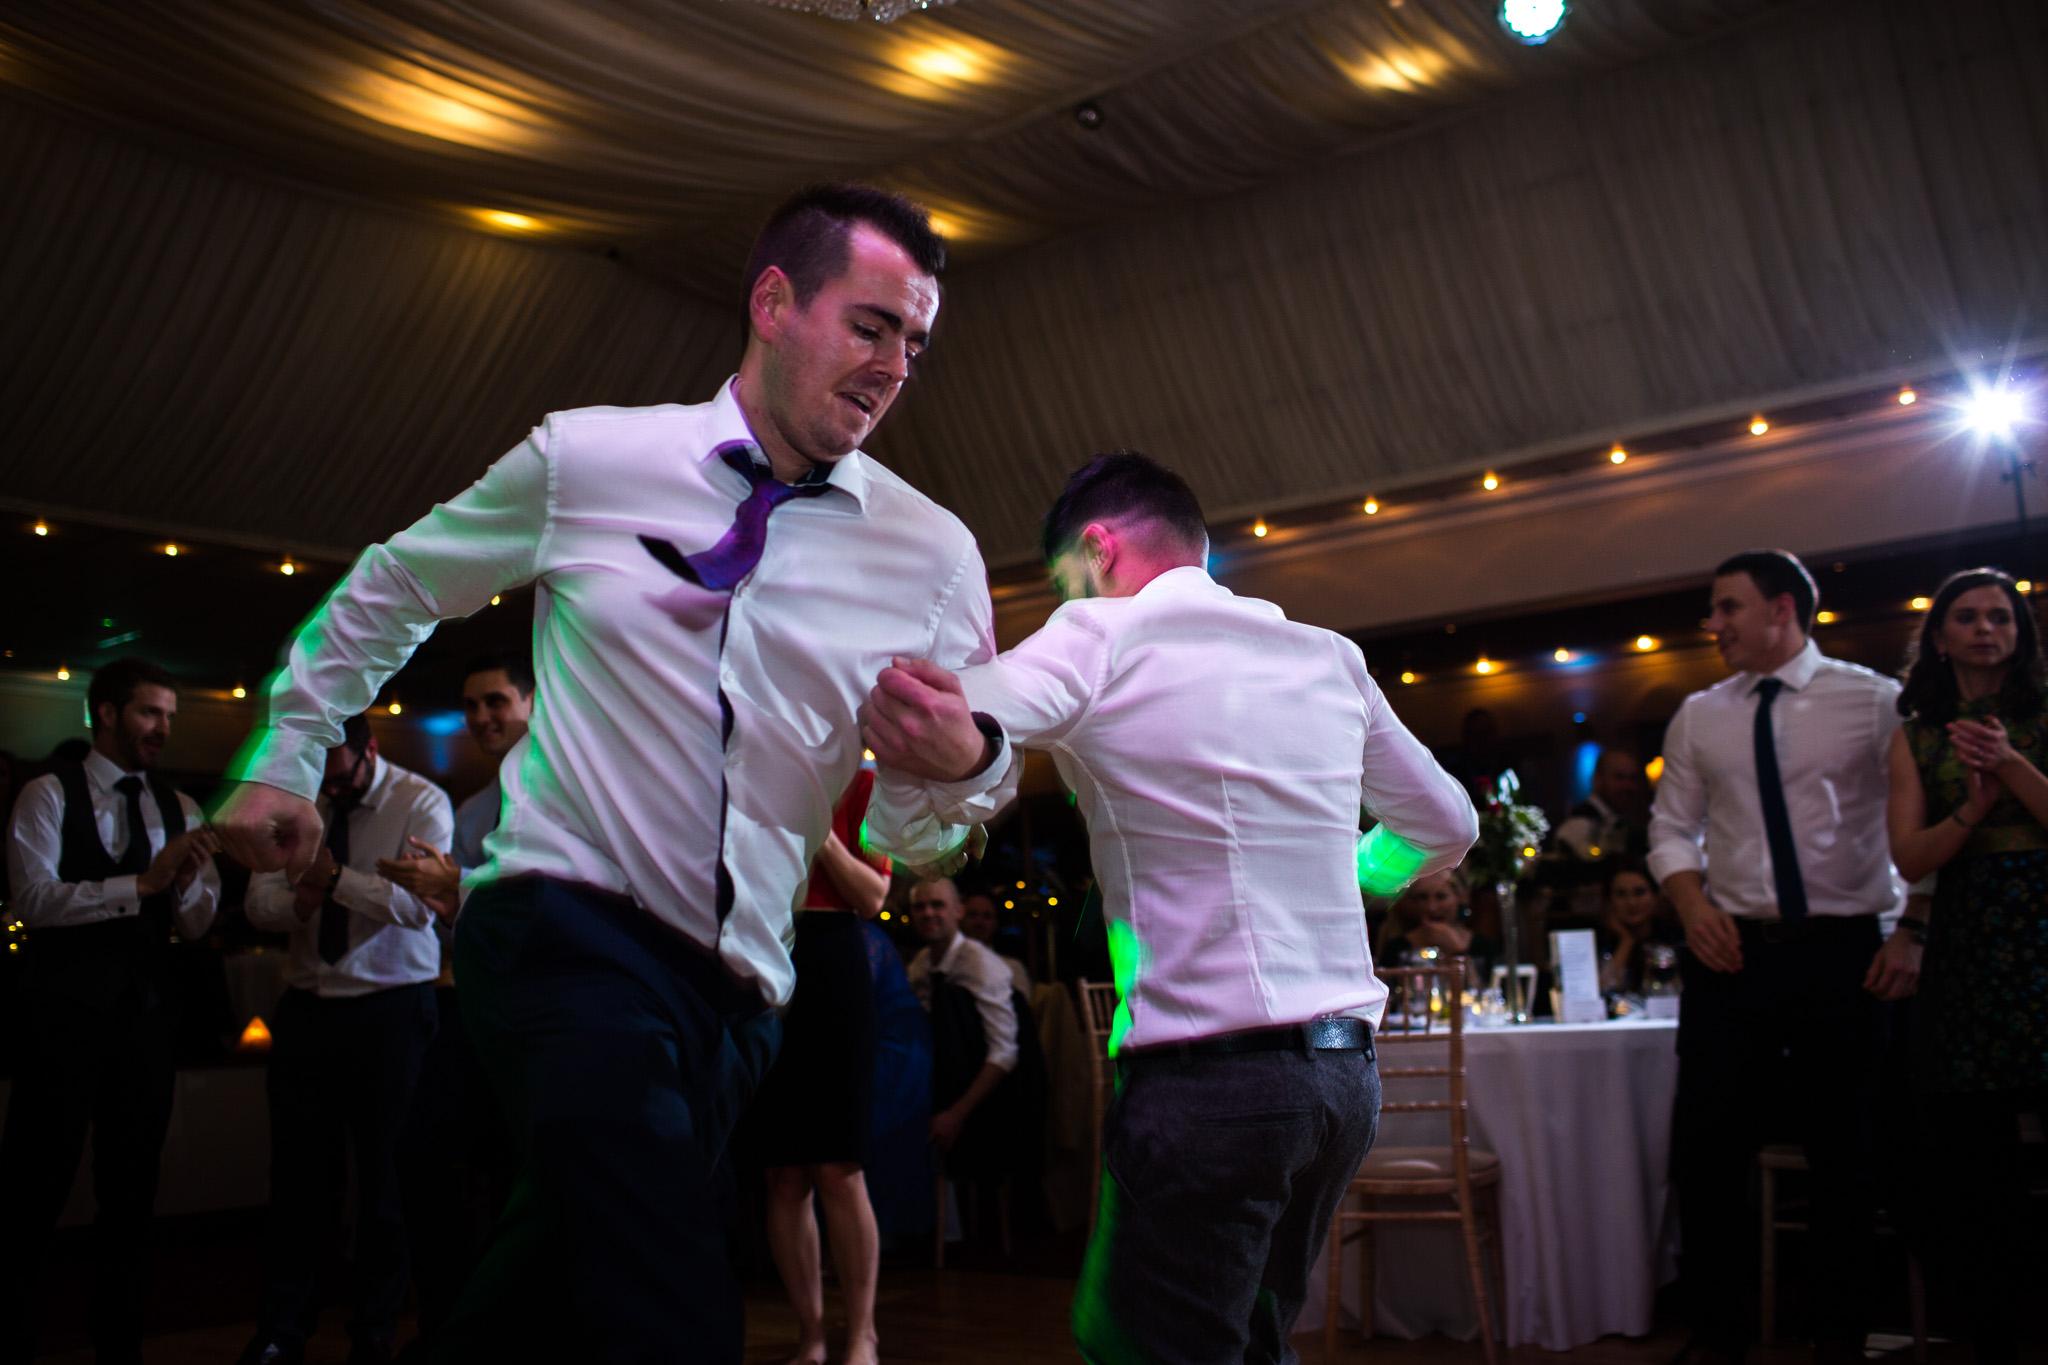 Mark_Barnes_Northern_Ireland_wedding_photographer_Harveys_Point_Donegall_Wedding_photography-Adam&Gemma-69.jpg